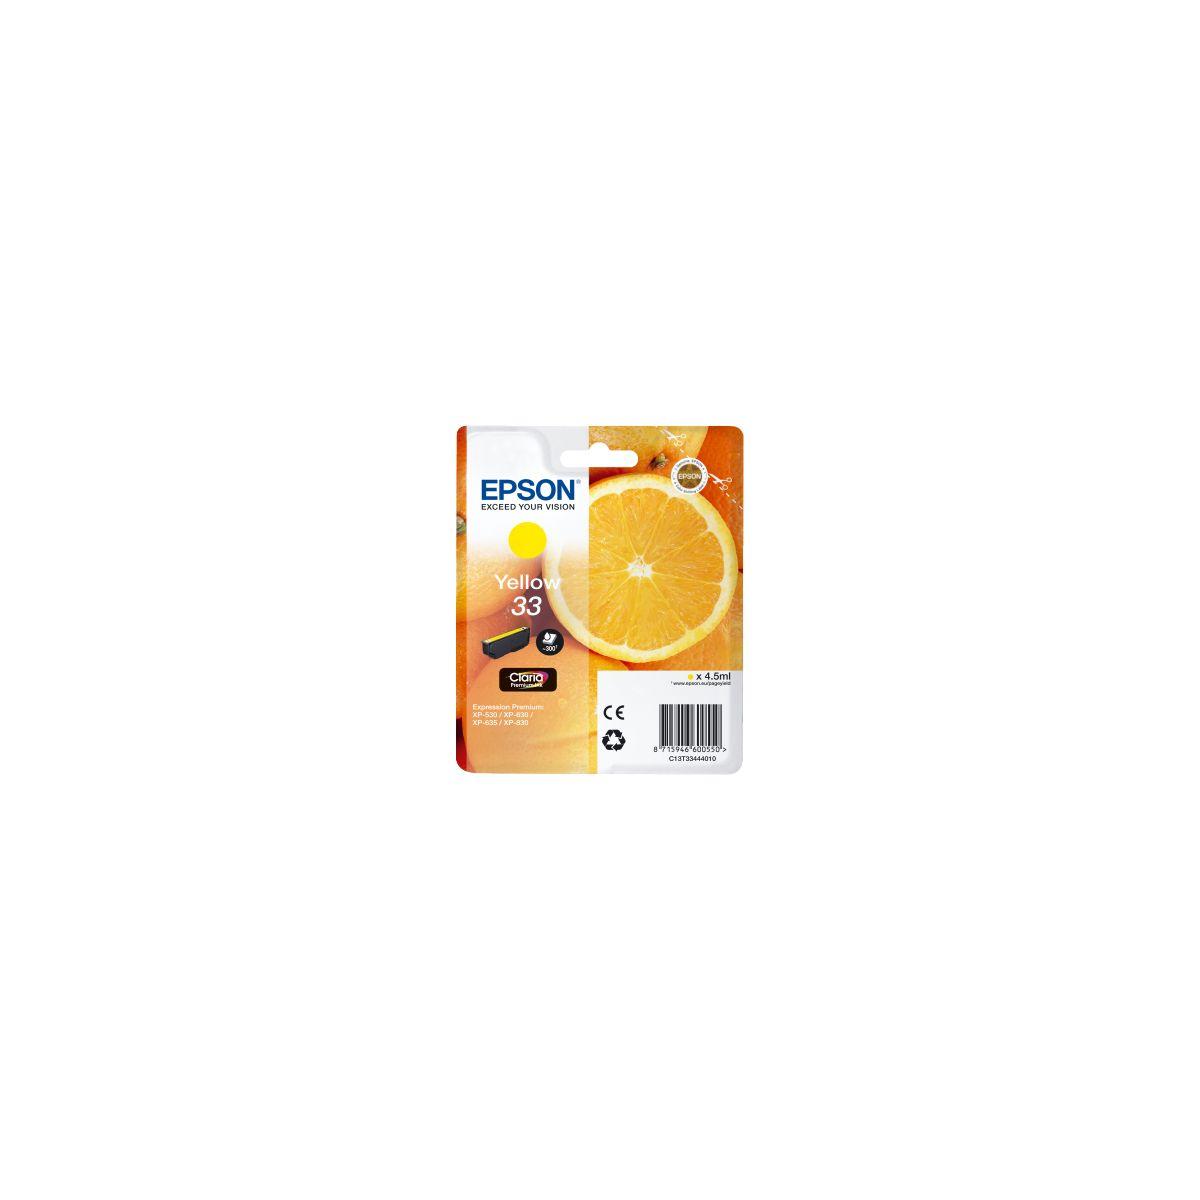 Cartouche d'encre epson t3344 jaune premium s�rie orange